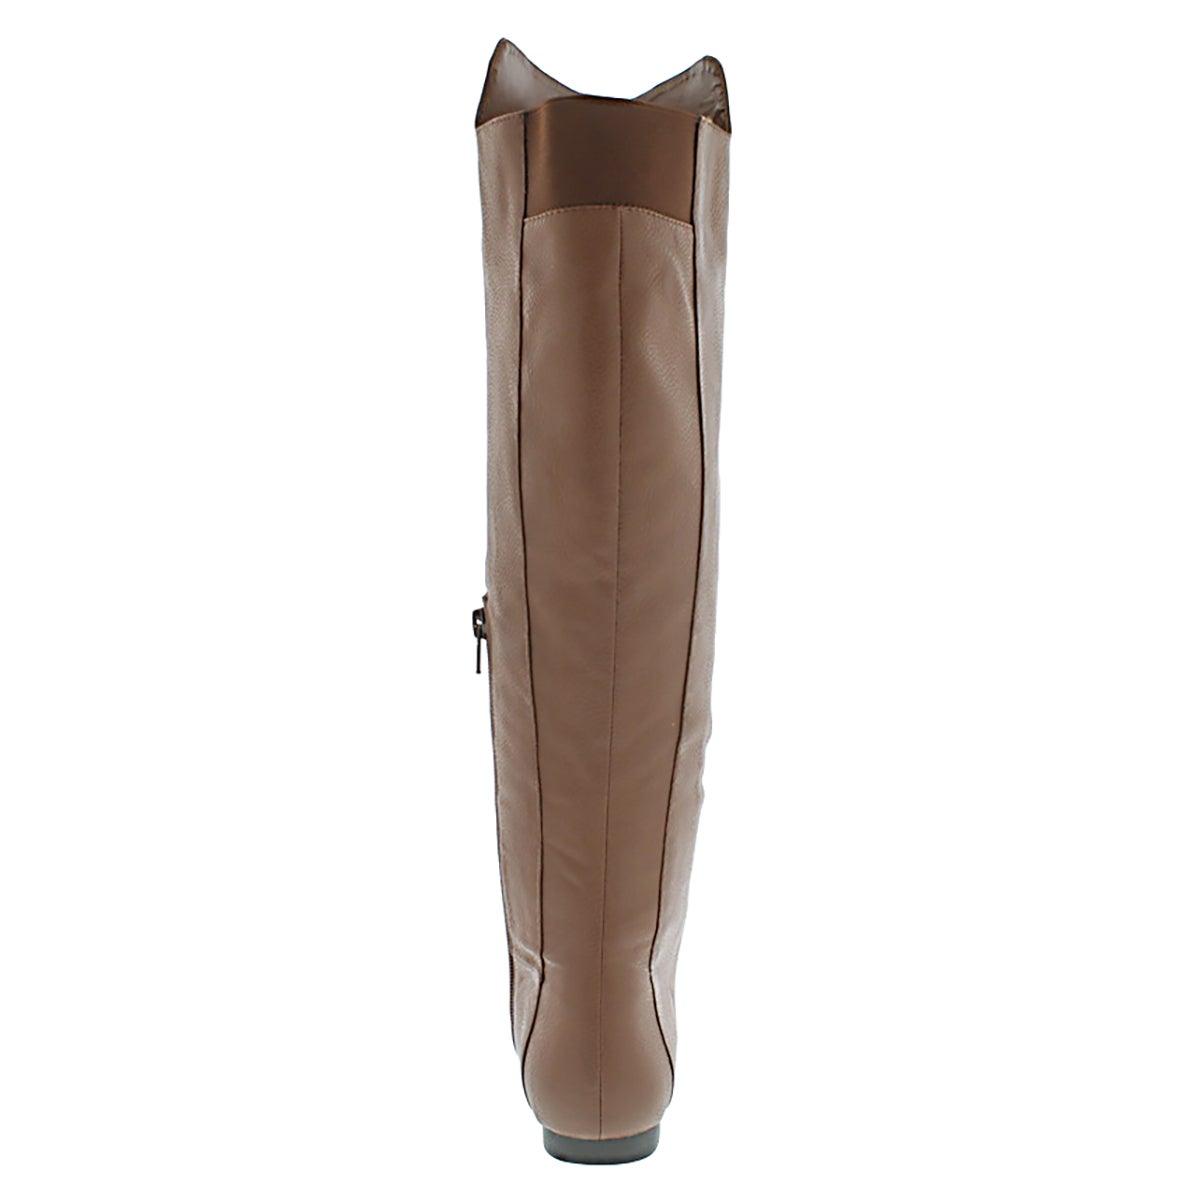 Lds Tiara brn tall casual boot